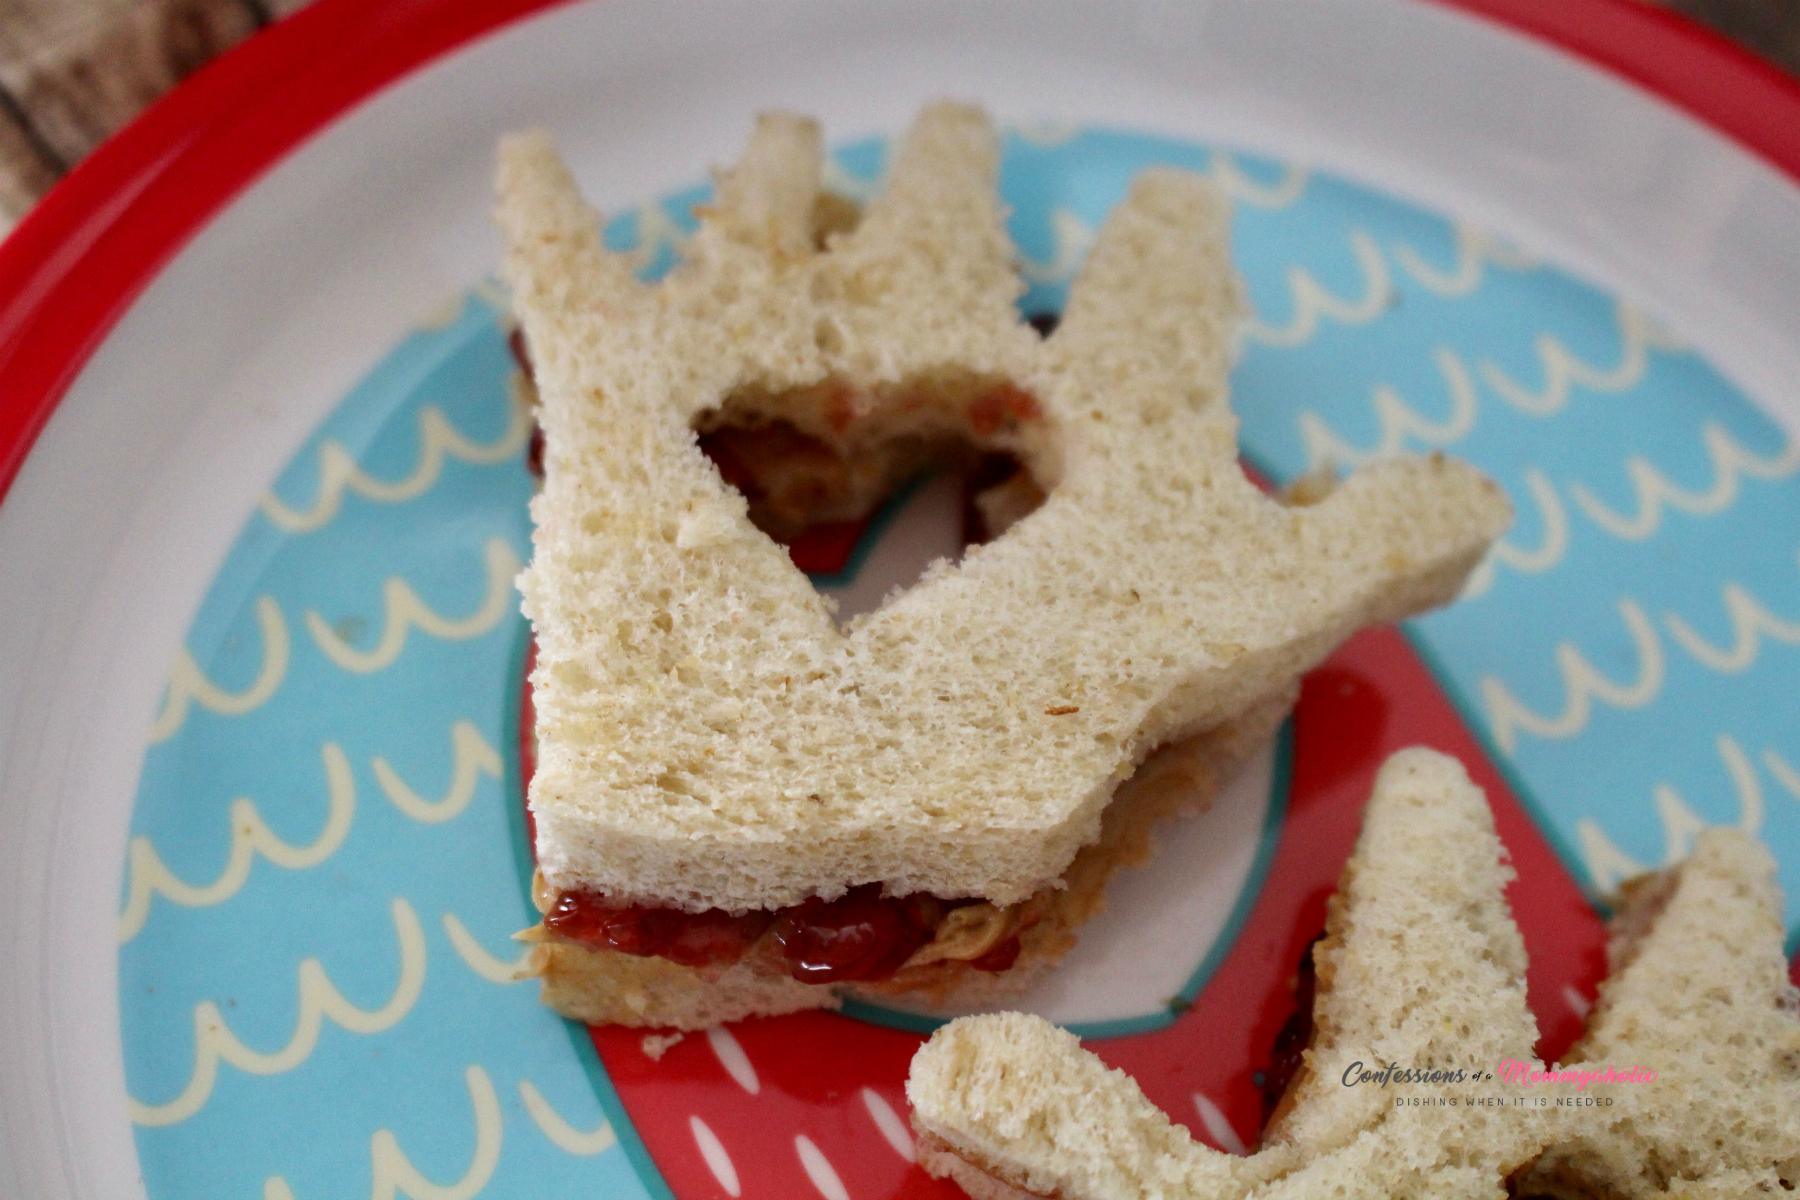 Closeup of Kissing Hand Sandwich